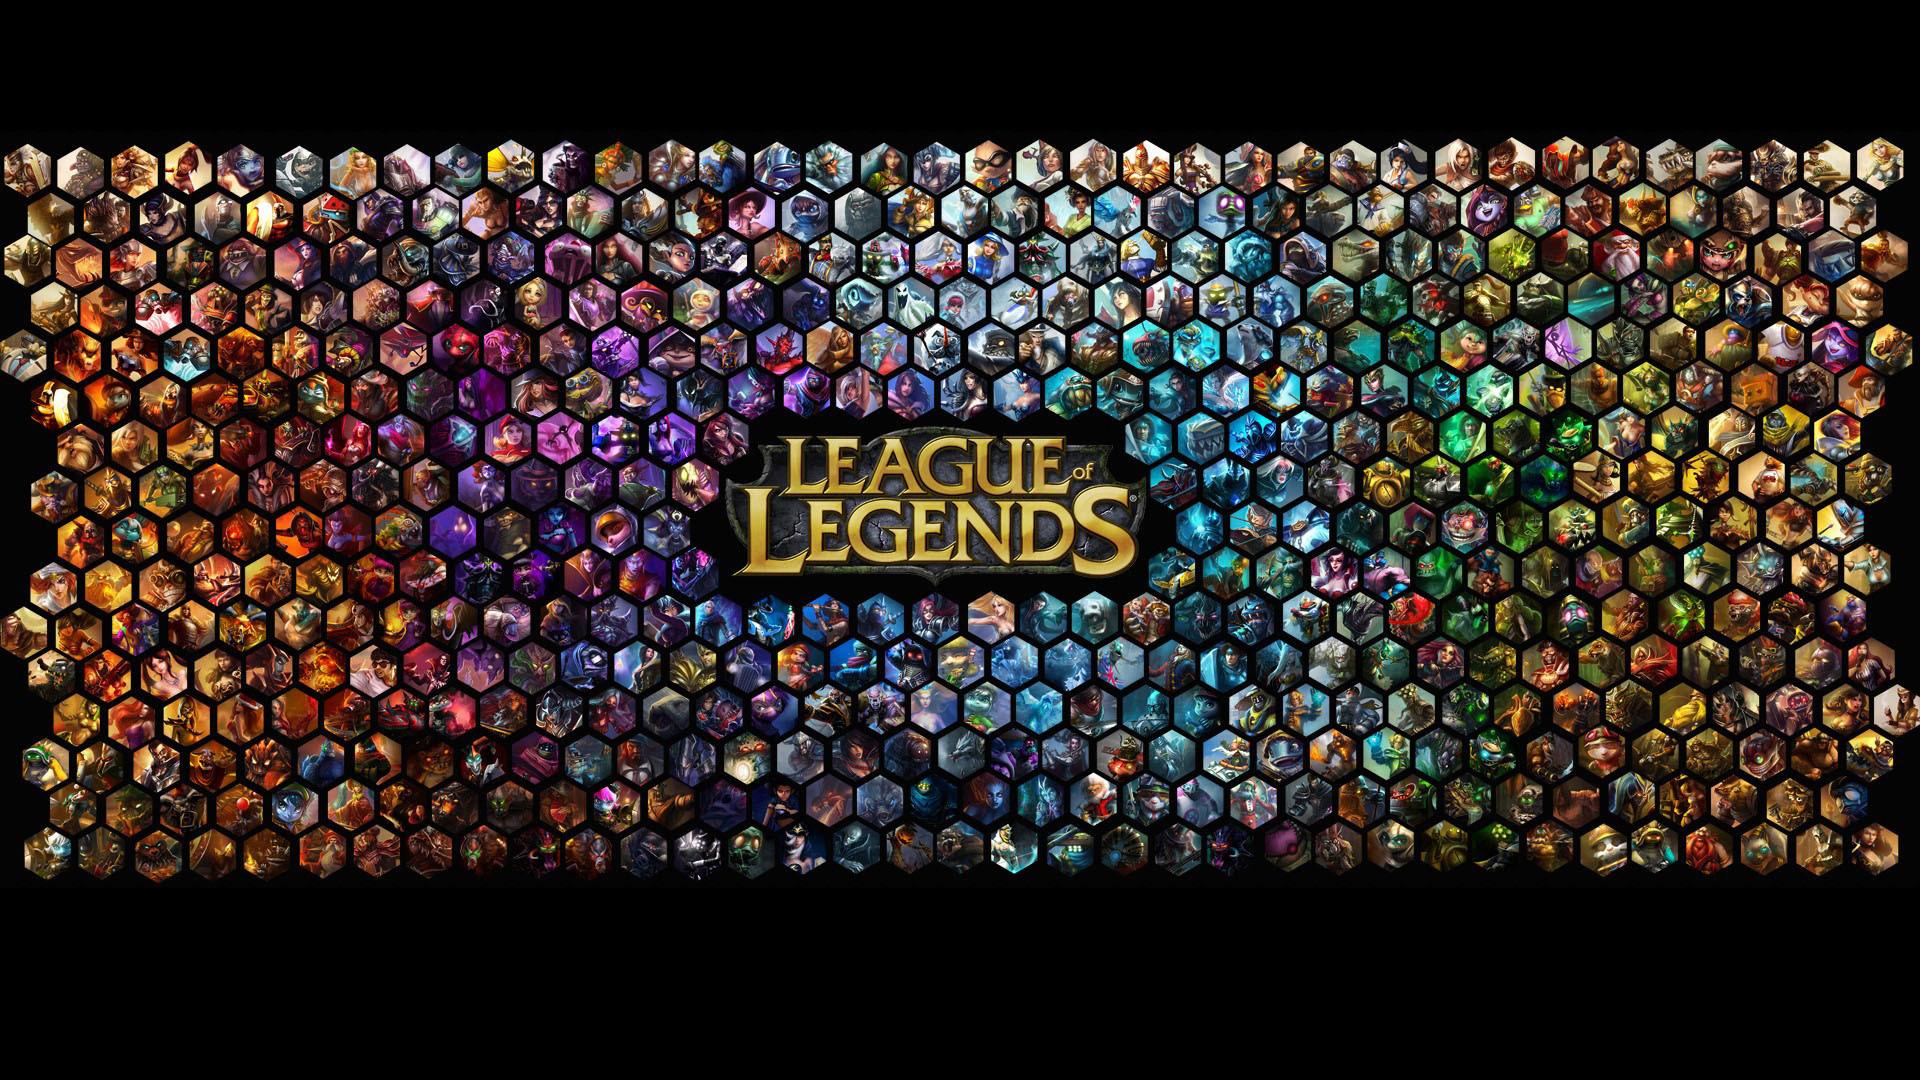 League of Legends Champions HD High Definition Wallpaper